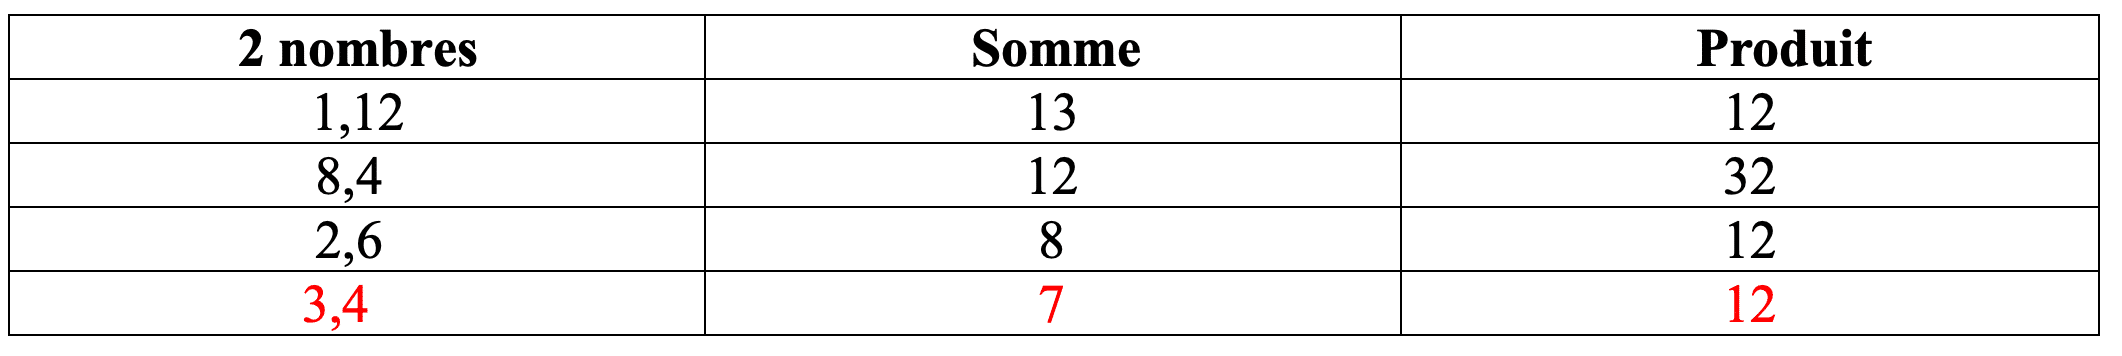 somme-produit -SOSprof